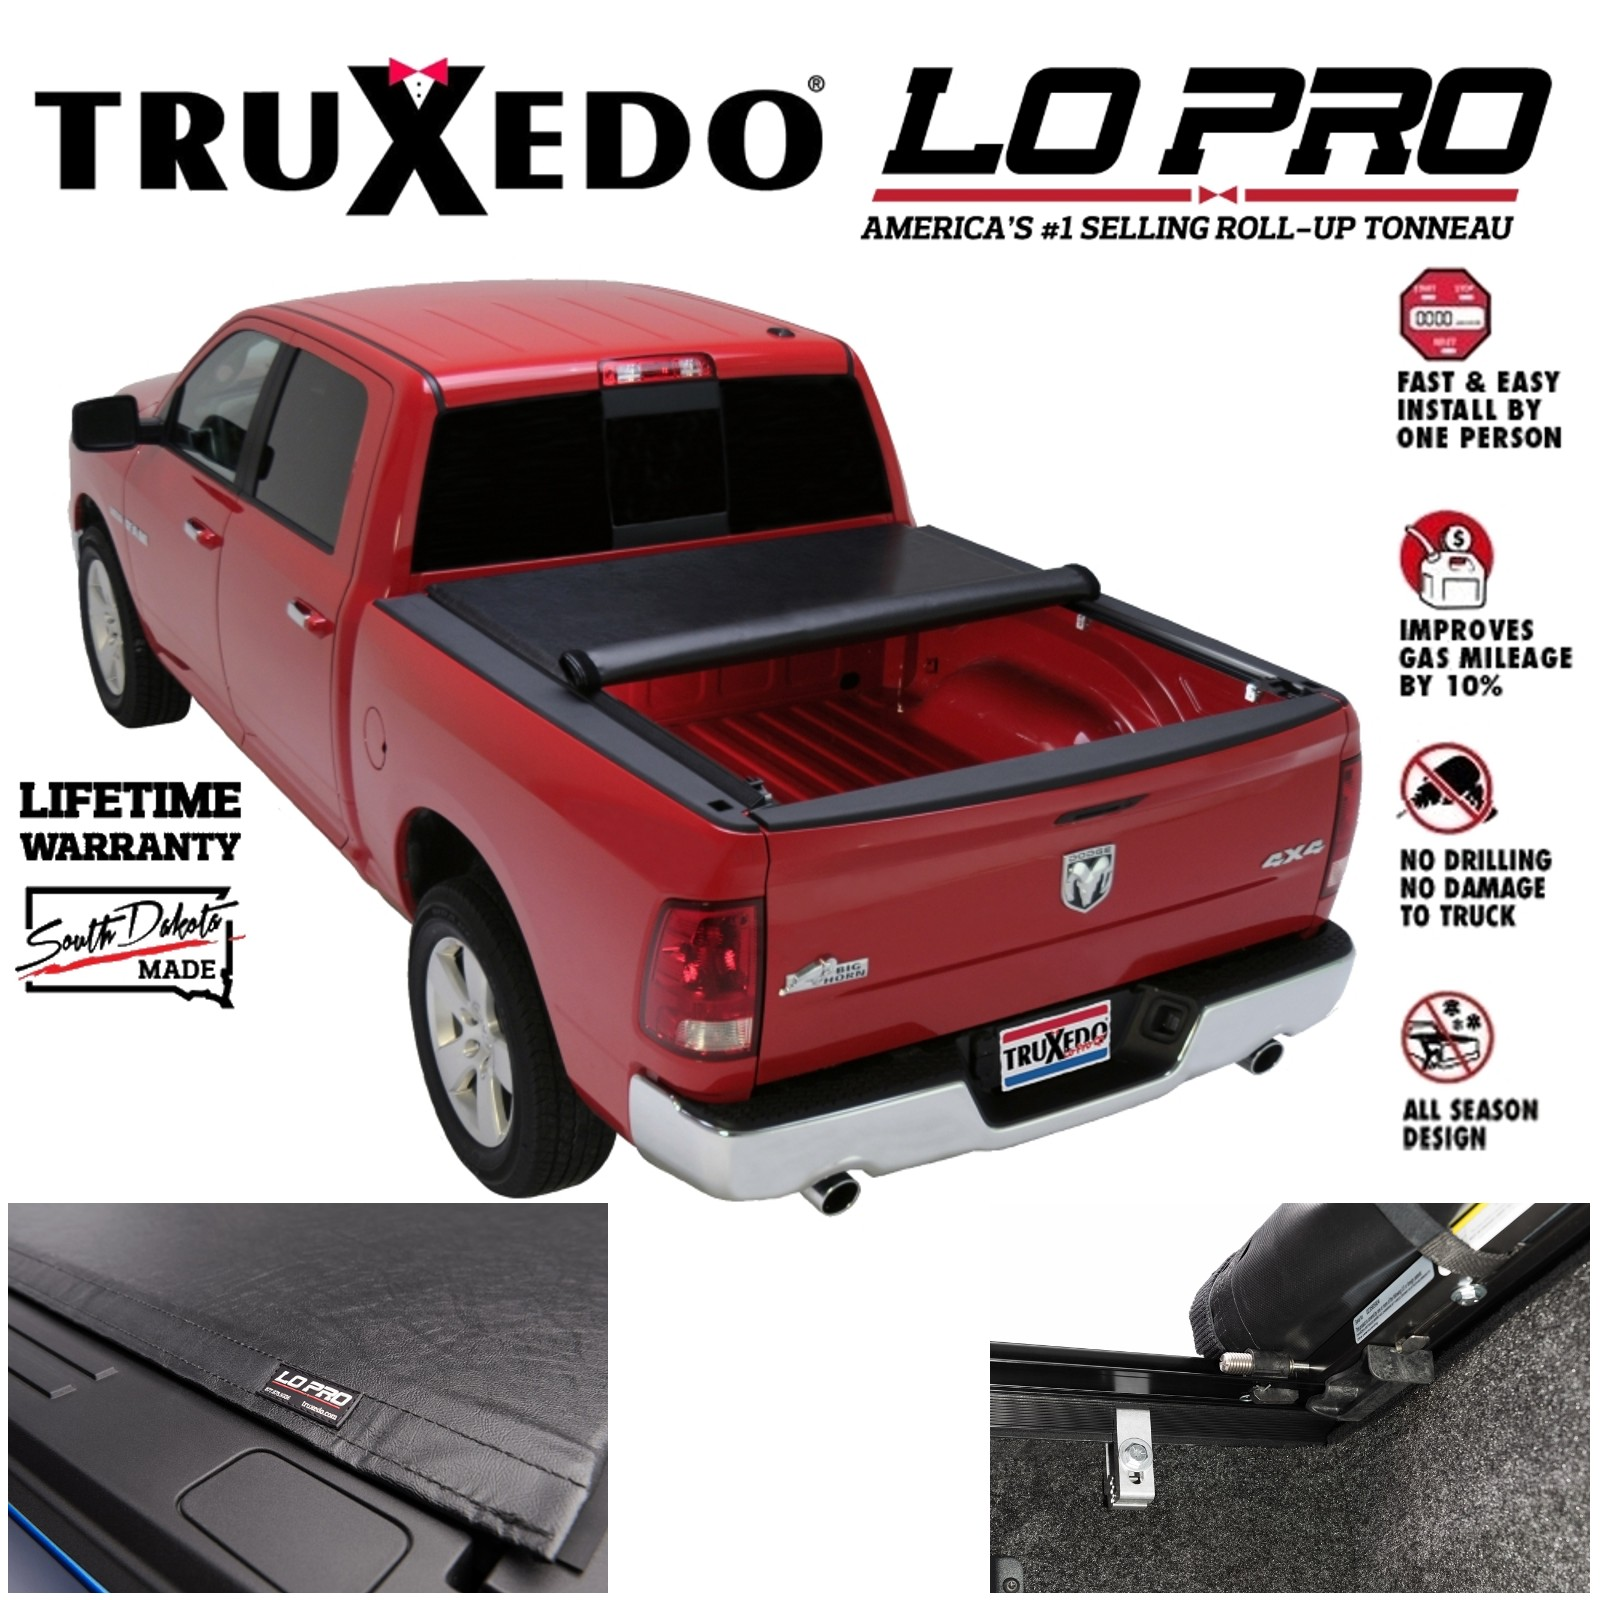 Truxedo Lopro Qt Roll Up Tonneau Cover For 2009 2018 Ram 1500 5 7 Bed W Ram Box Ebay